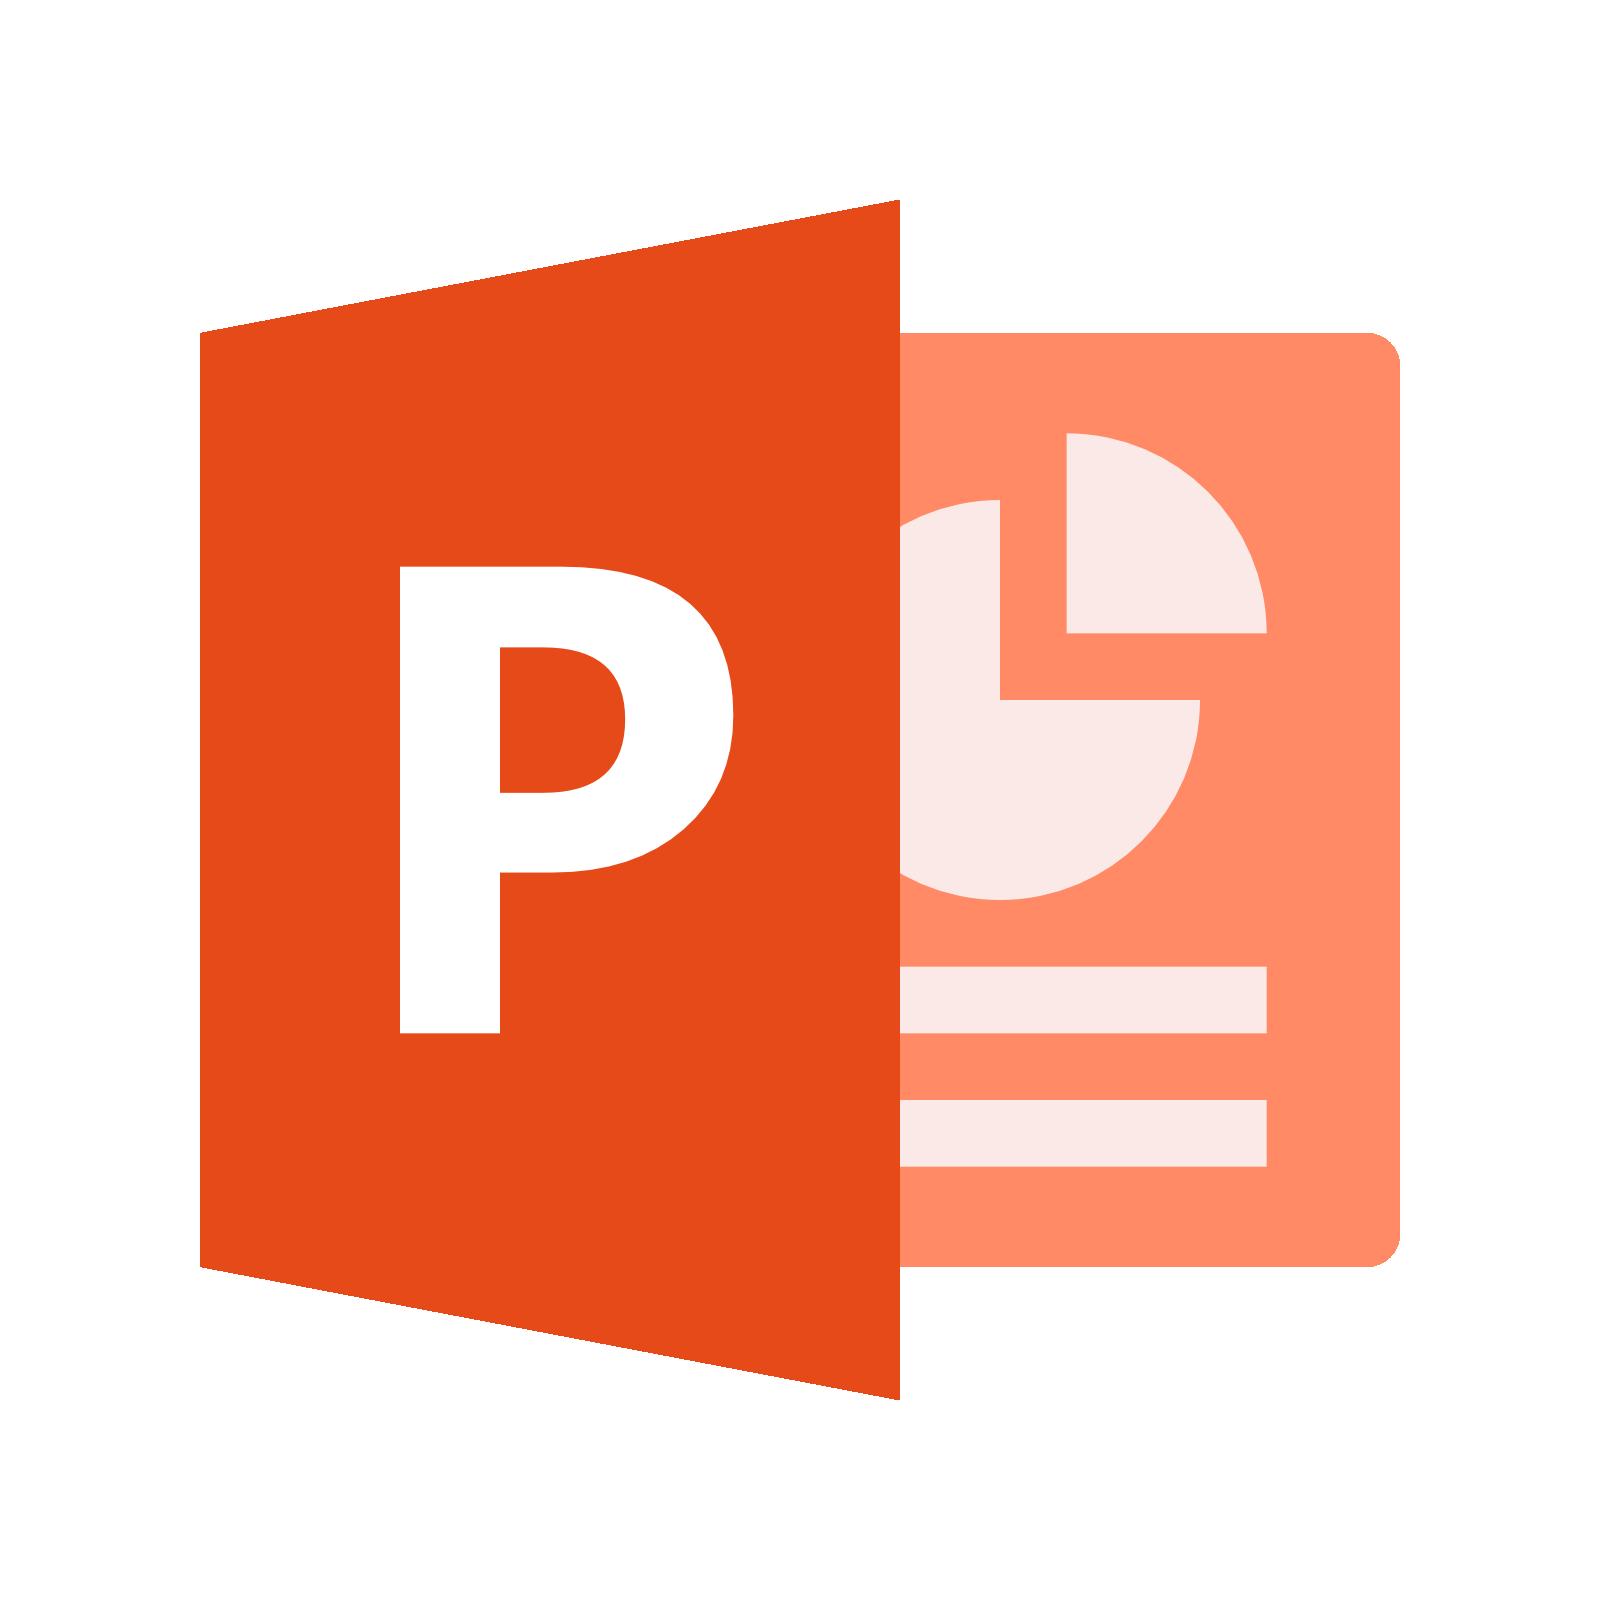 1600x1600 15 Powerpoint Vector Ppt Background For Free Download On Mbtskoudsalg